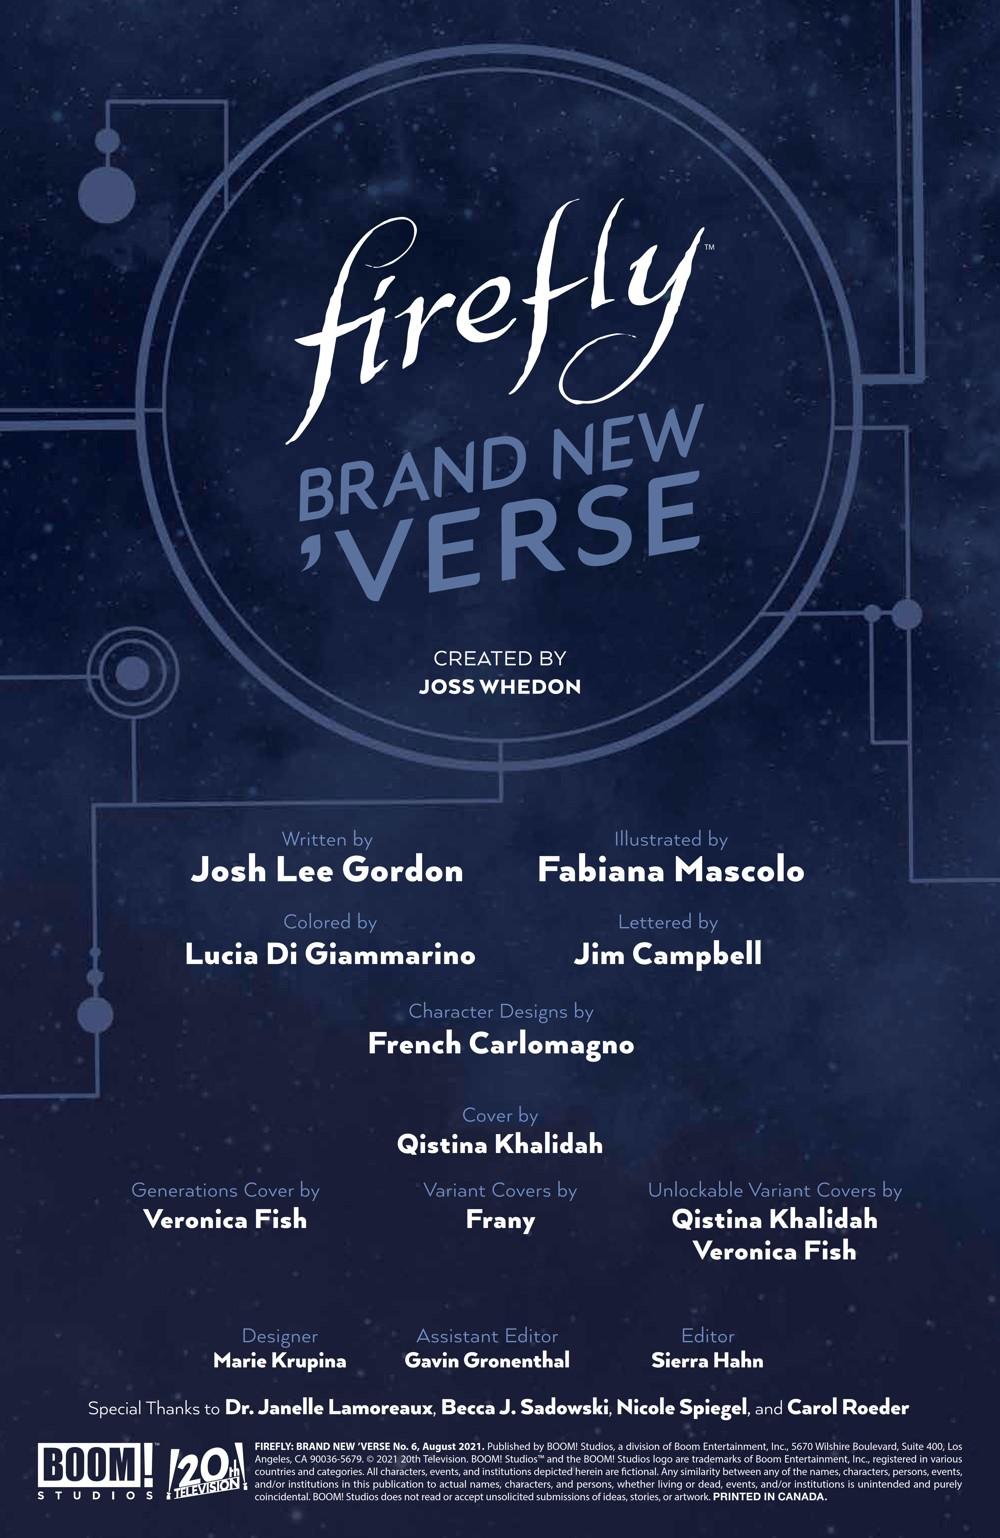 Firefly_BrandNewVerse_006_PRESS_2 ComicList Previews: FIREFLY BRAND NEW 'VERSE #6 (OF 6)